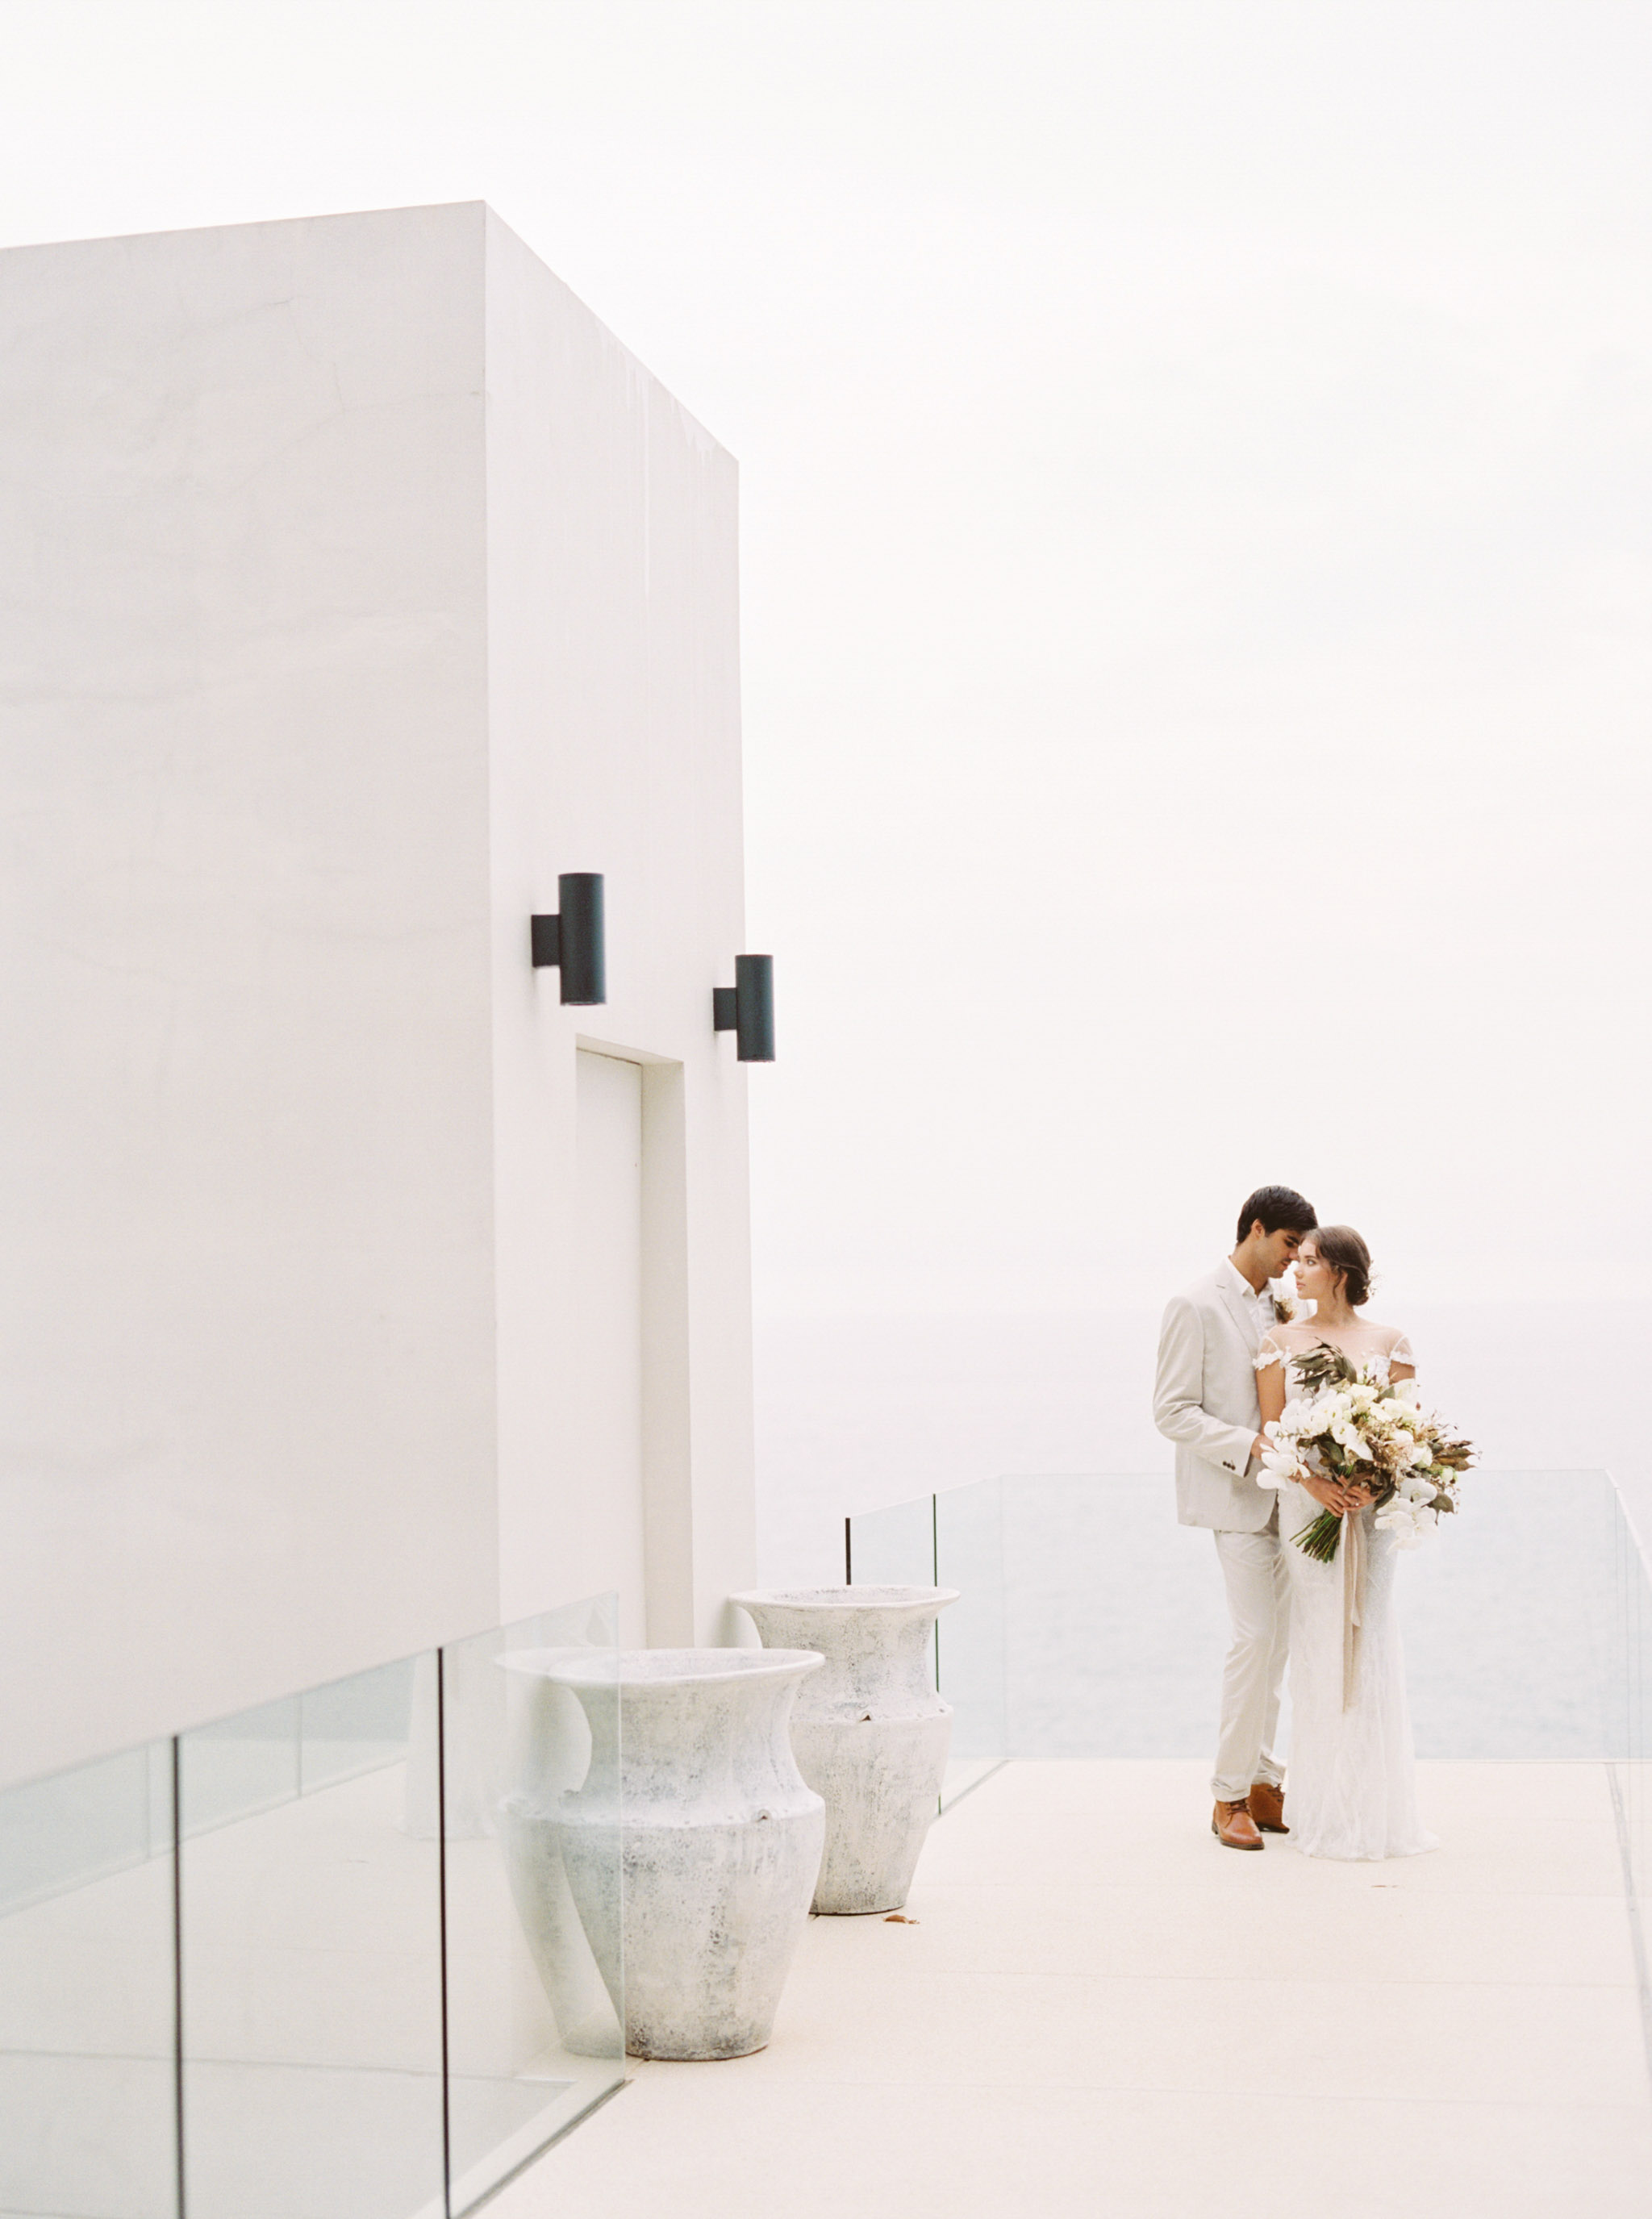 Destination Wedding Phuket Thailand Fine Art Film Photographer Sheri McMahon-00067-67.jpg